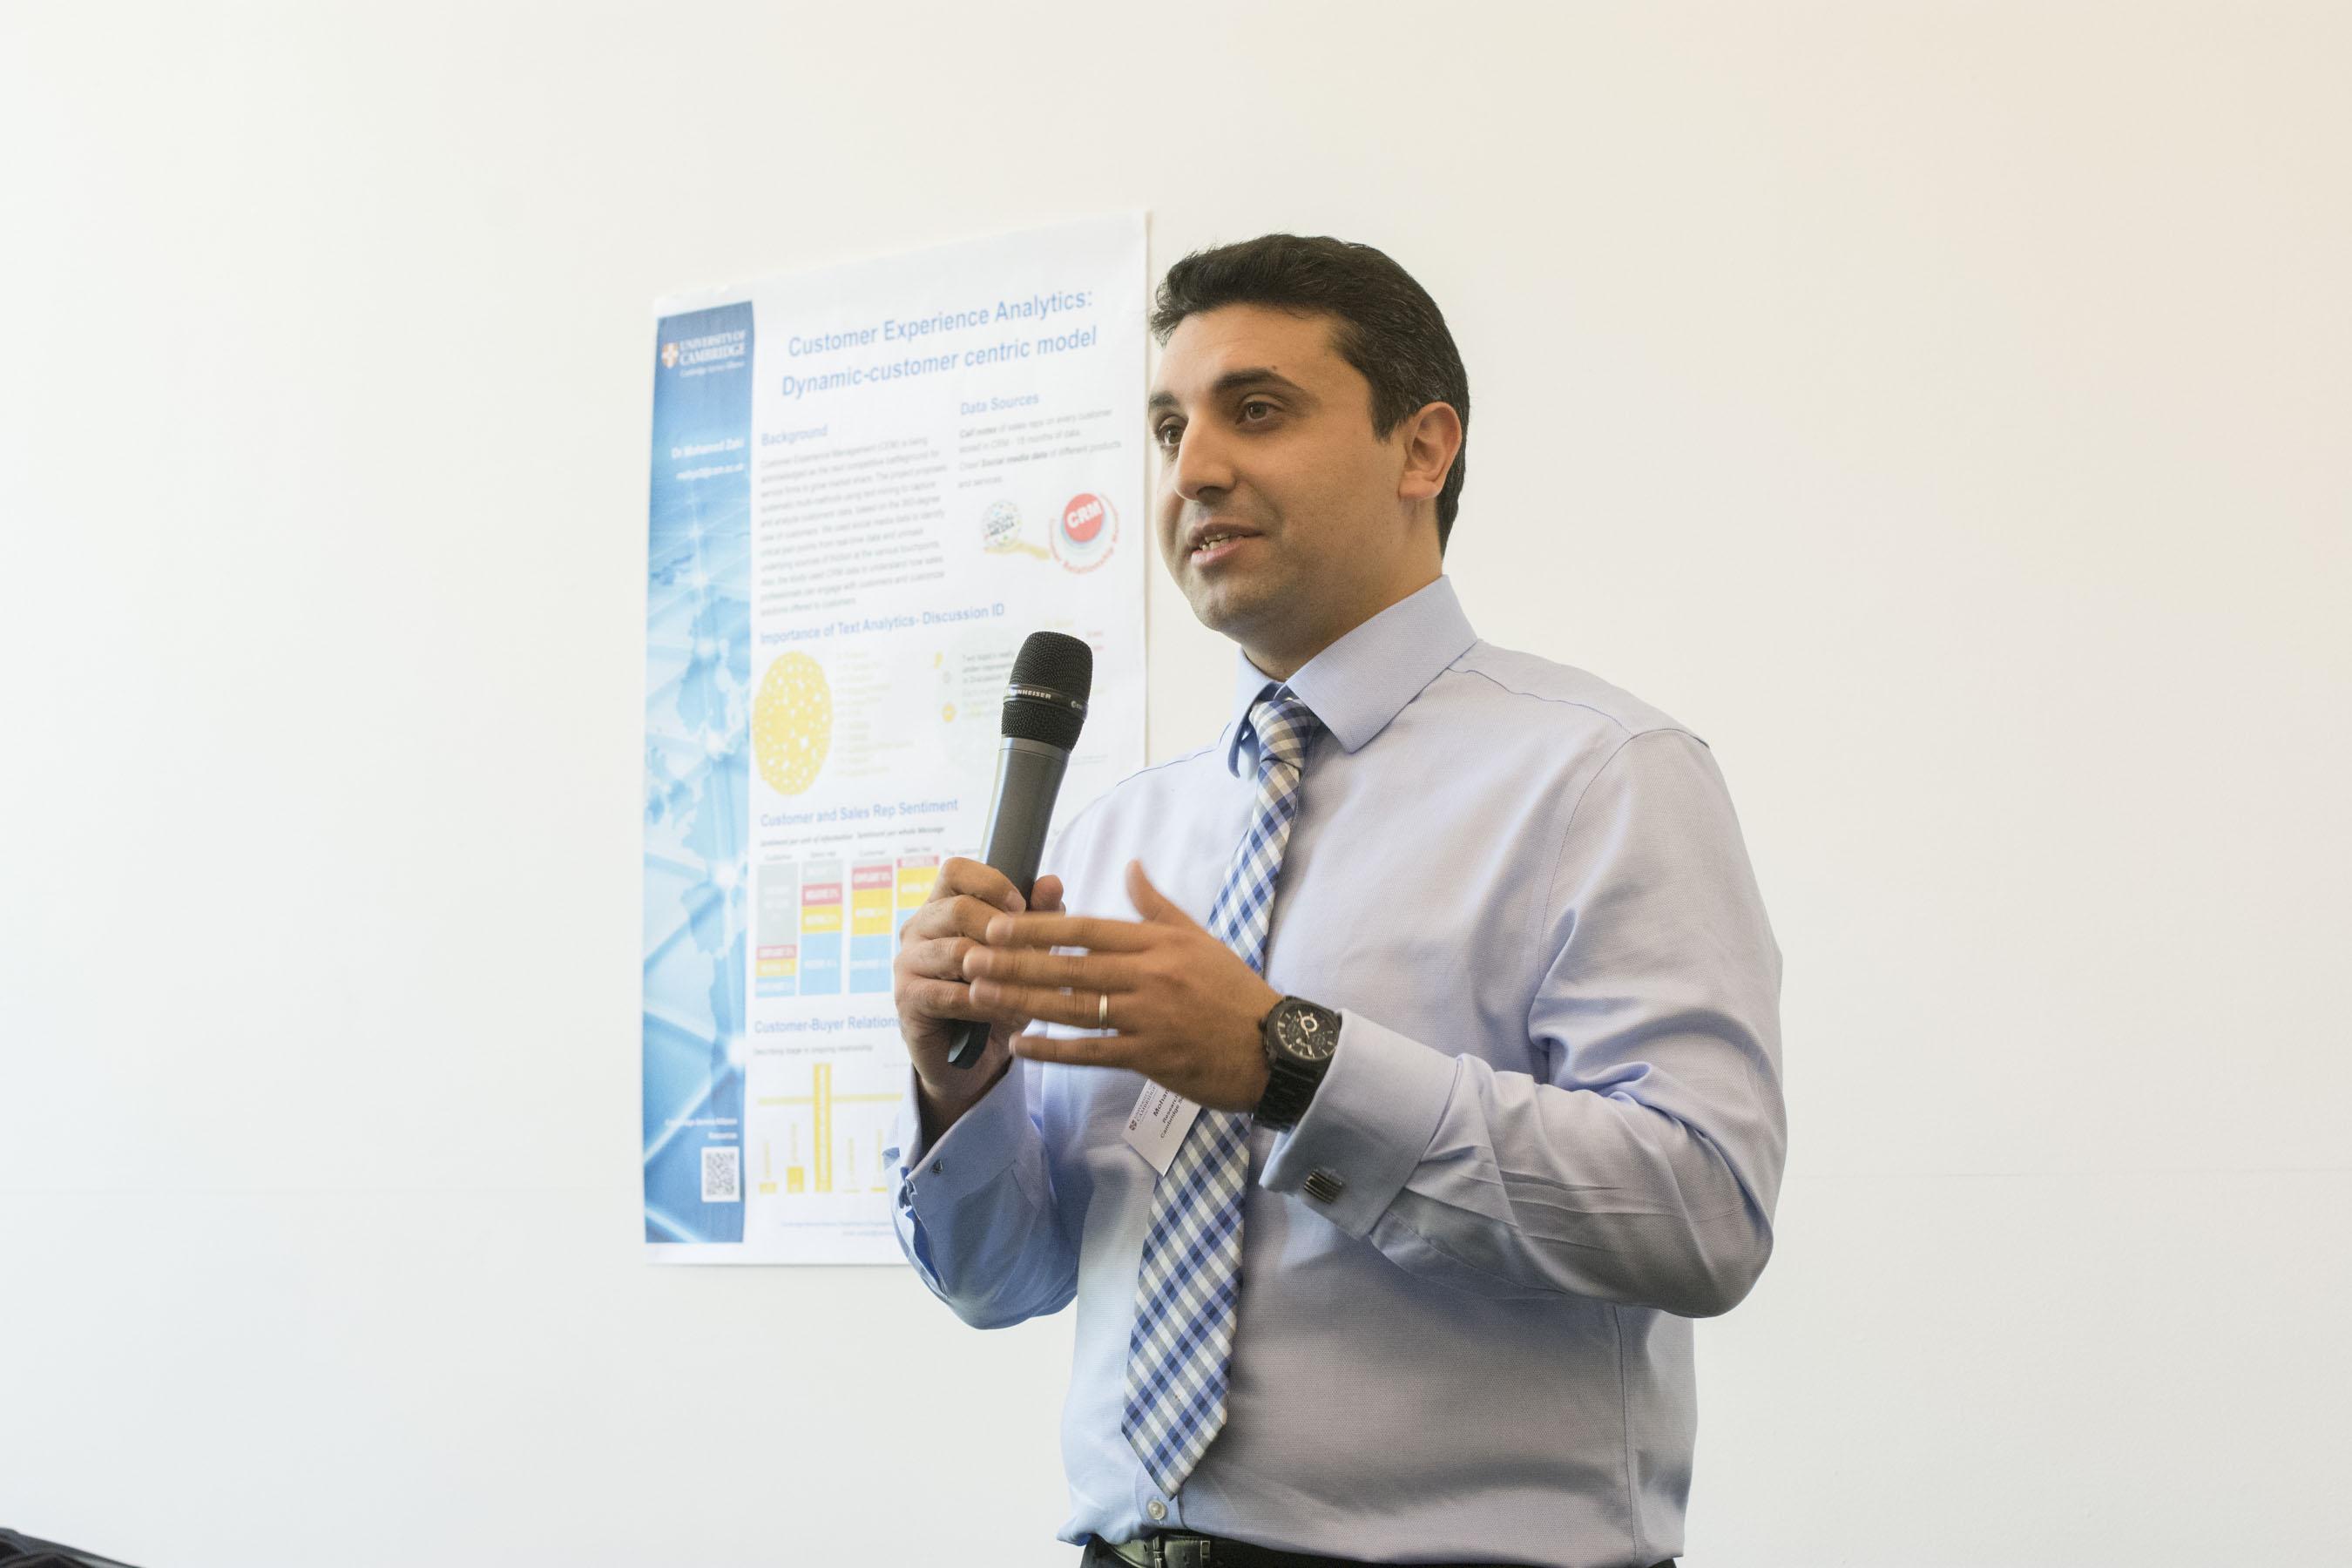 Customer Experience Analytics - Data Insights Cambridge Event